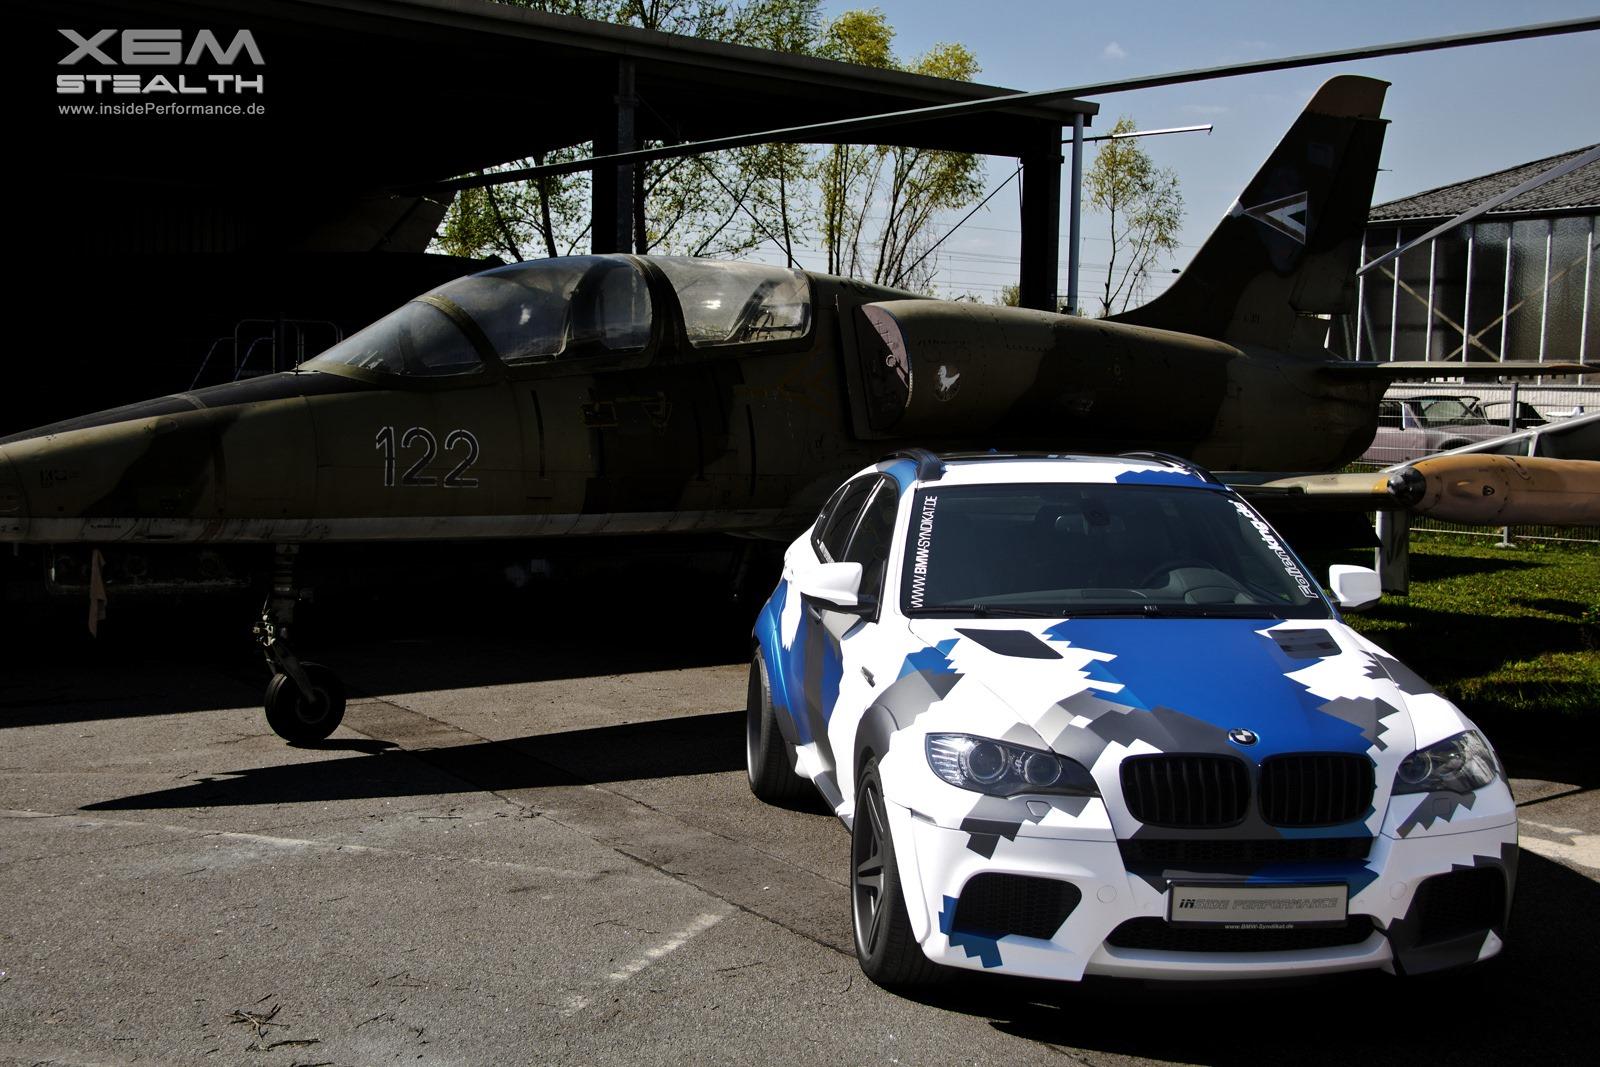 revista de motor, novedades, competiciu00f3n, fotos espu00eda BMW M GmbH ...